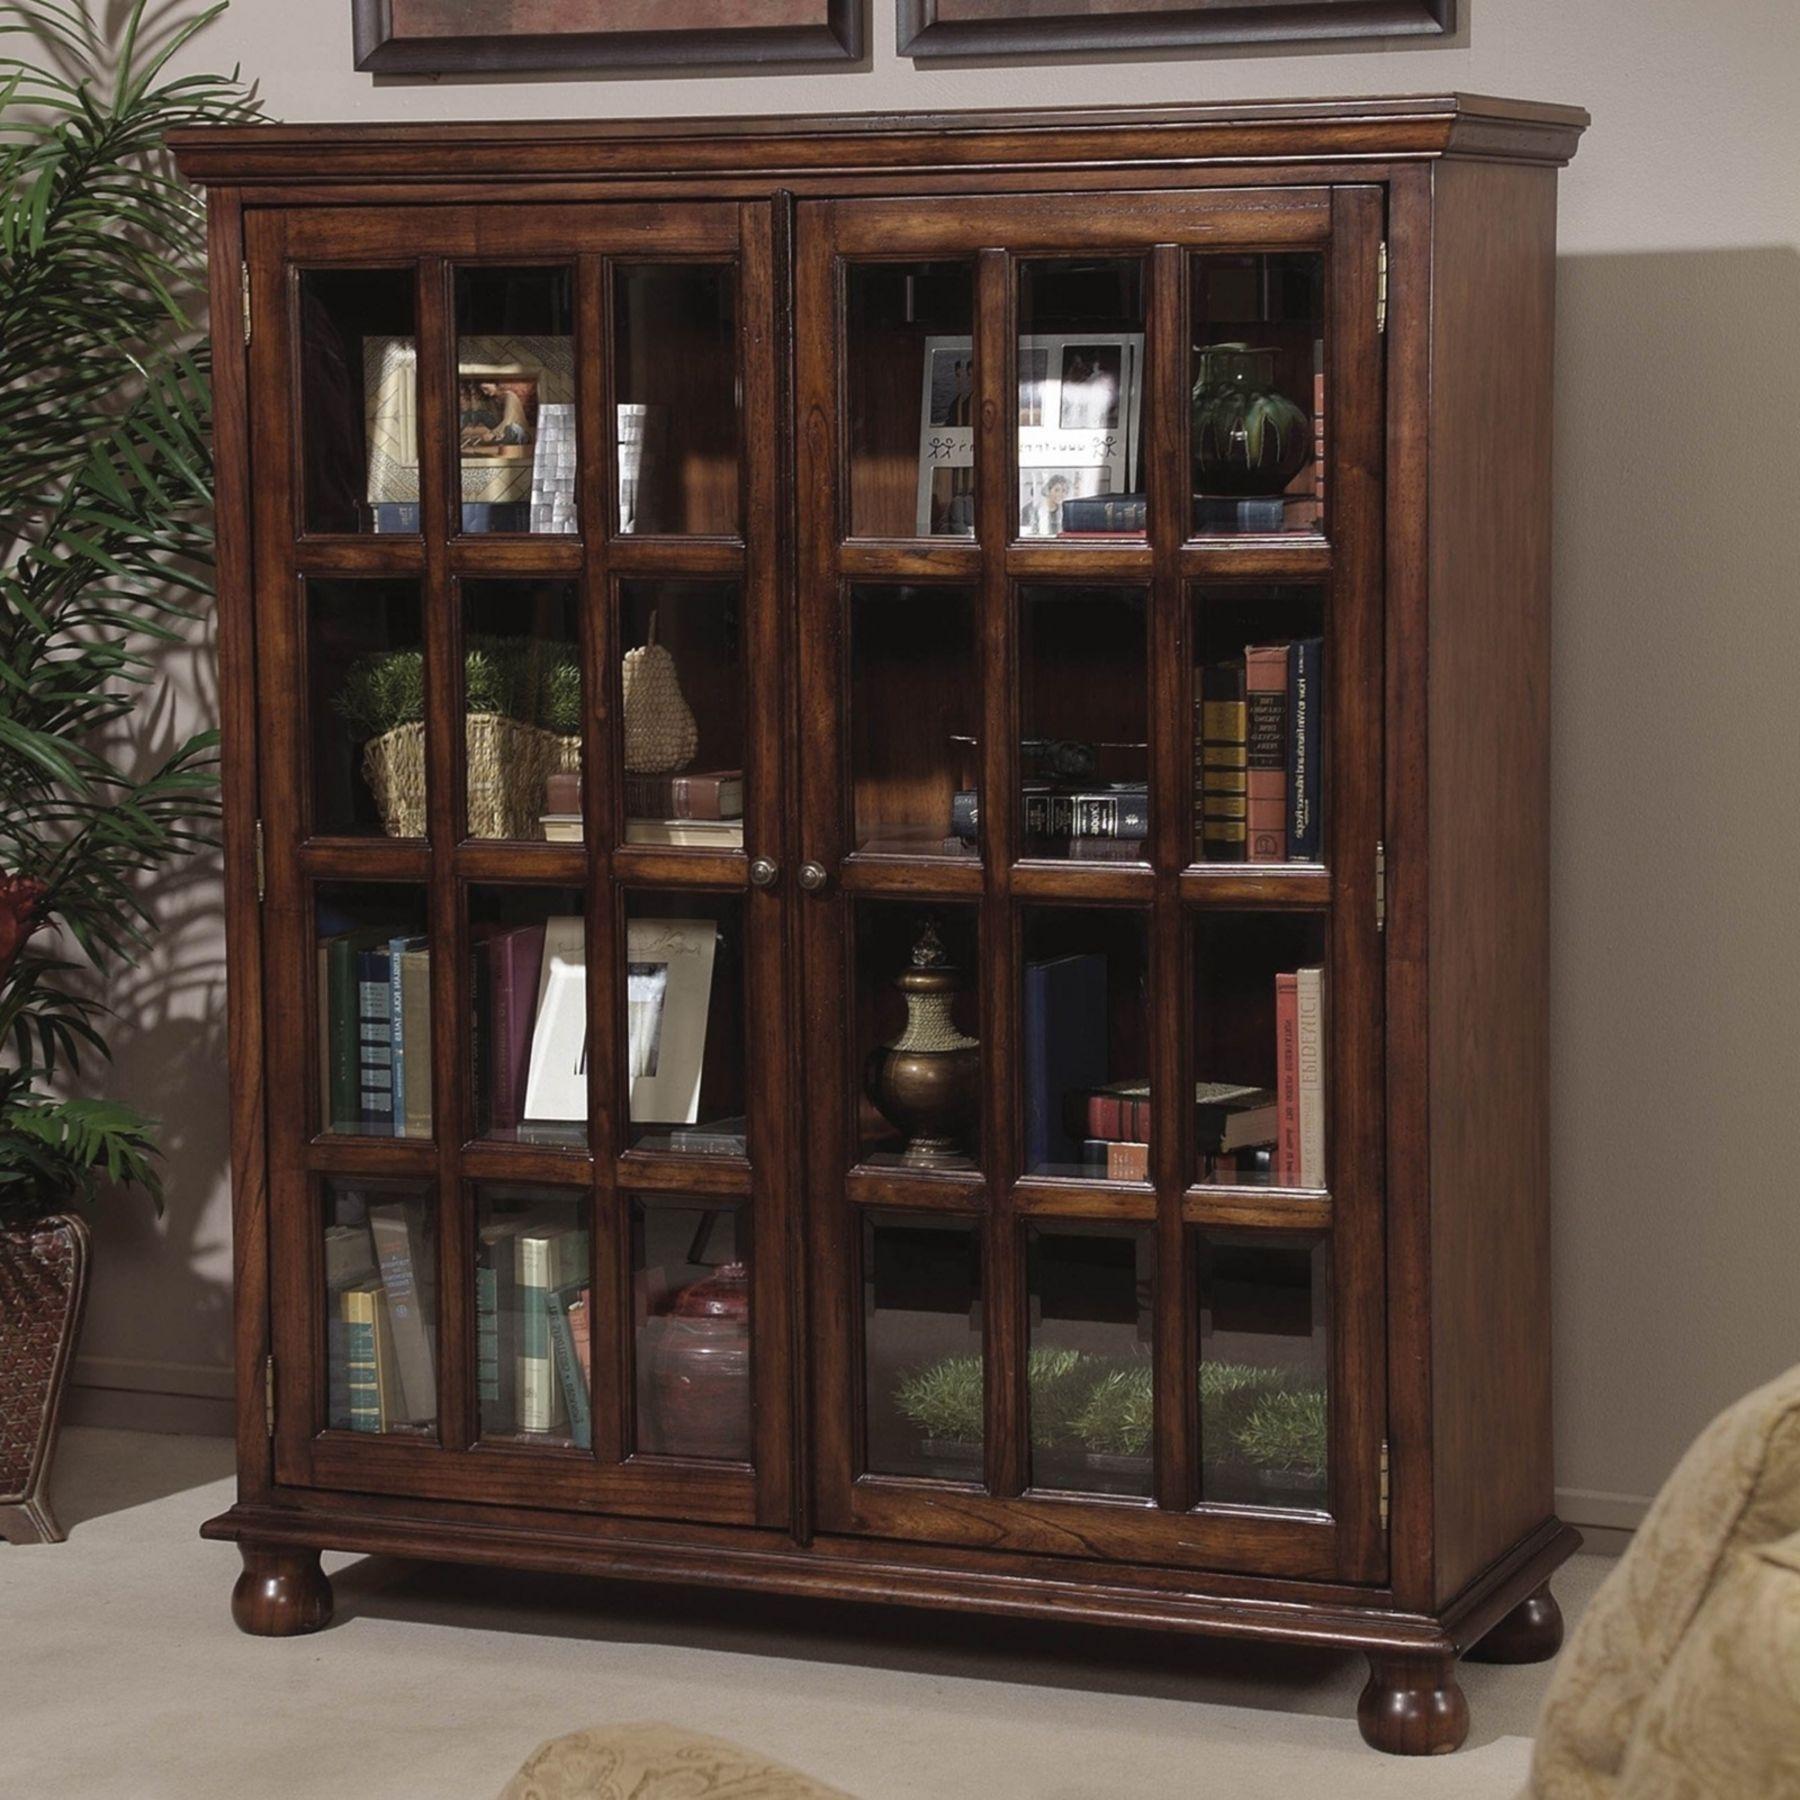 Trendy Bookshelf Designs Ideas Are Popular This Year44